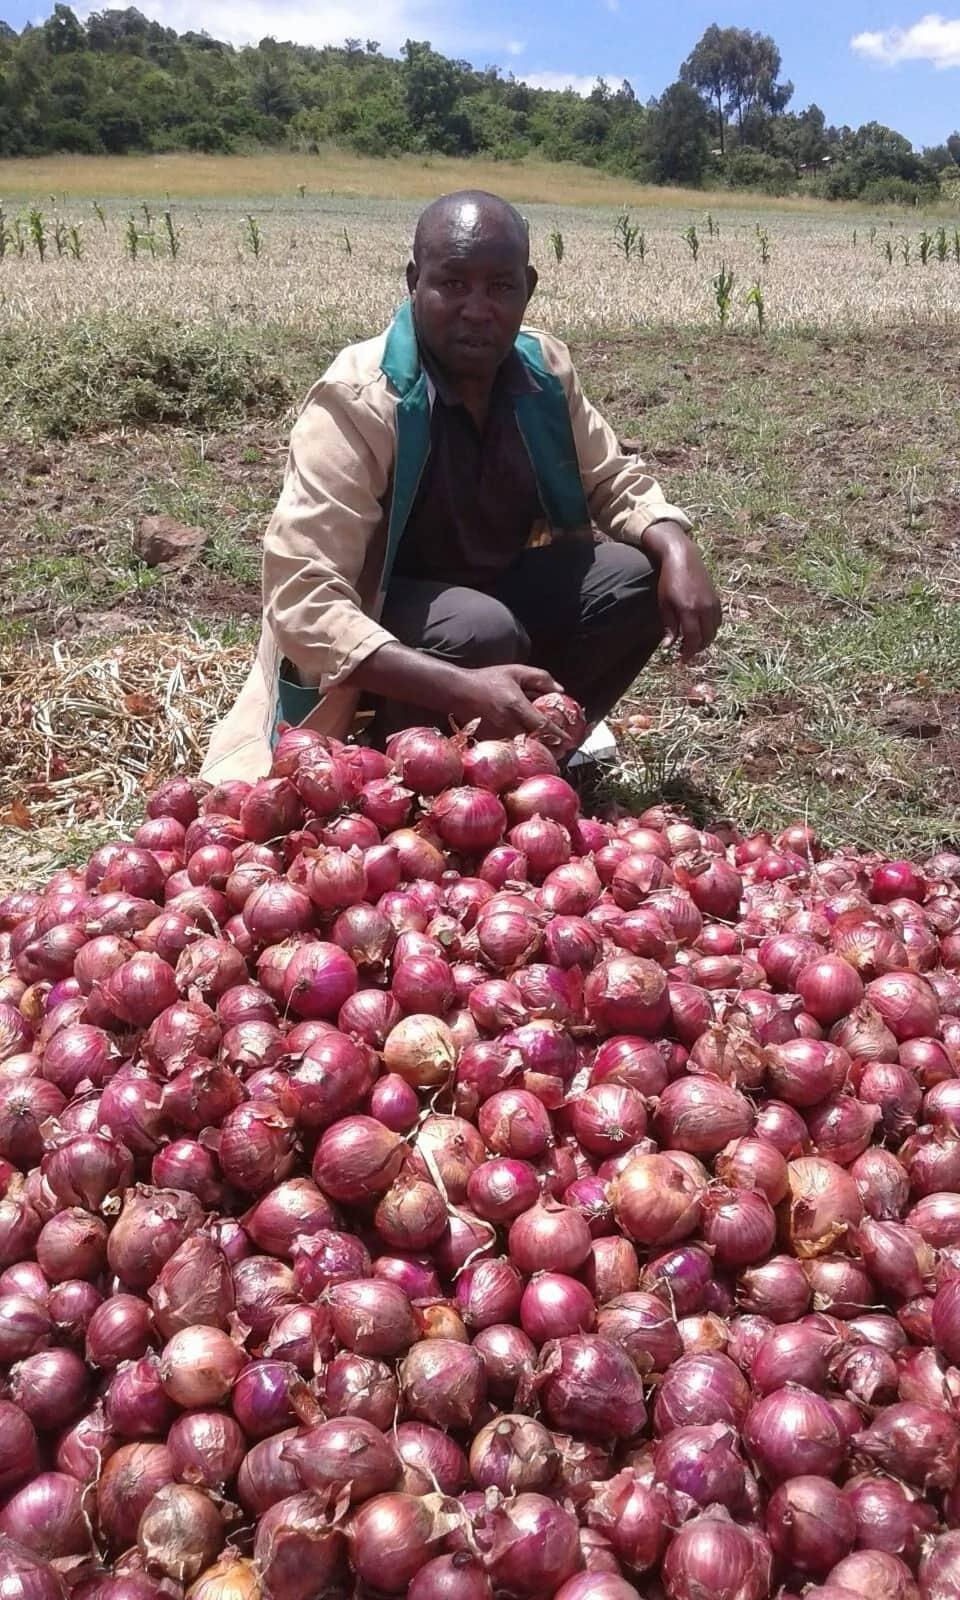 Greenhouse onion farming in Kenya